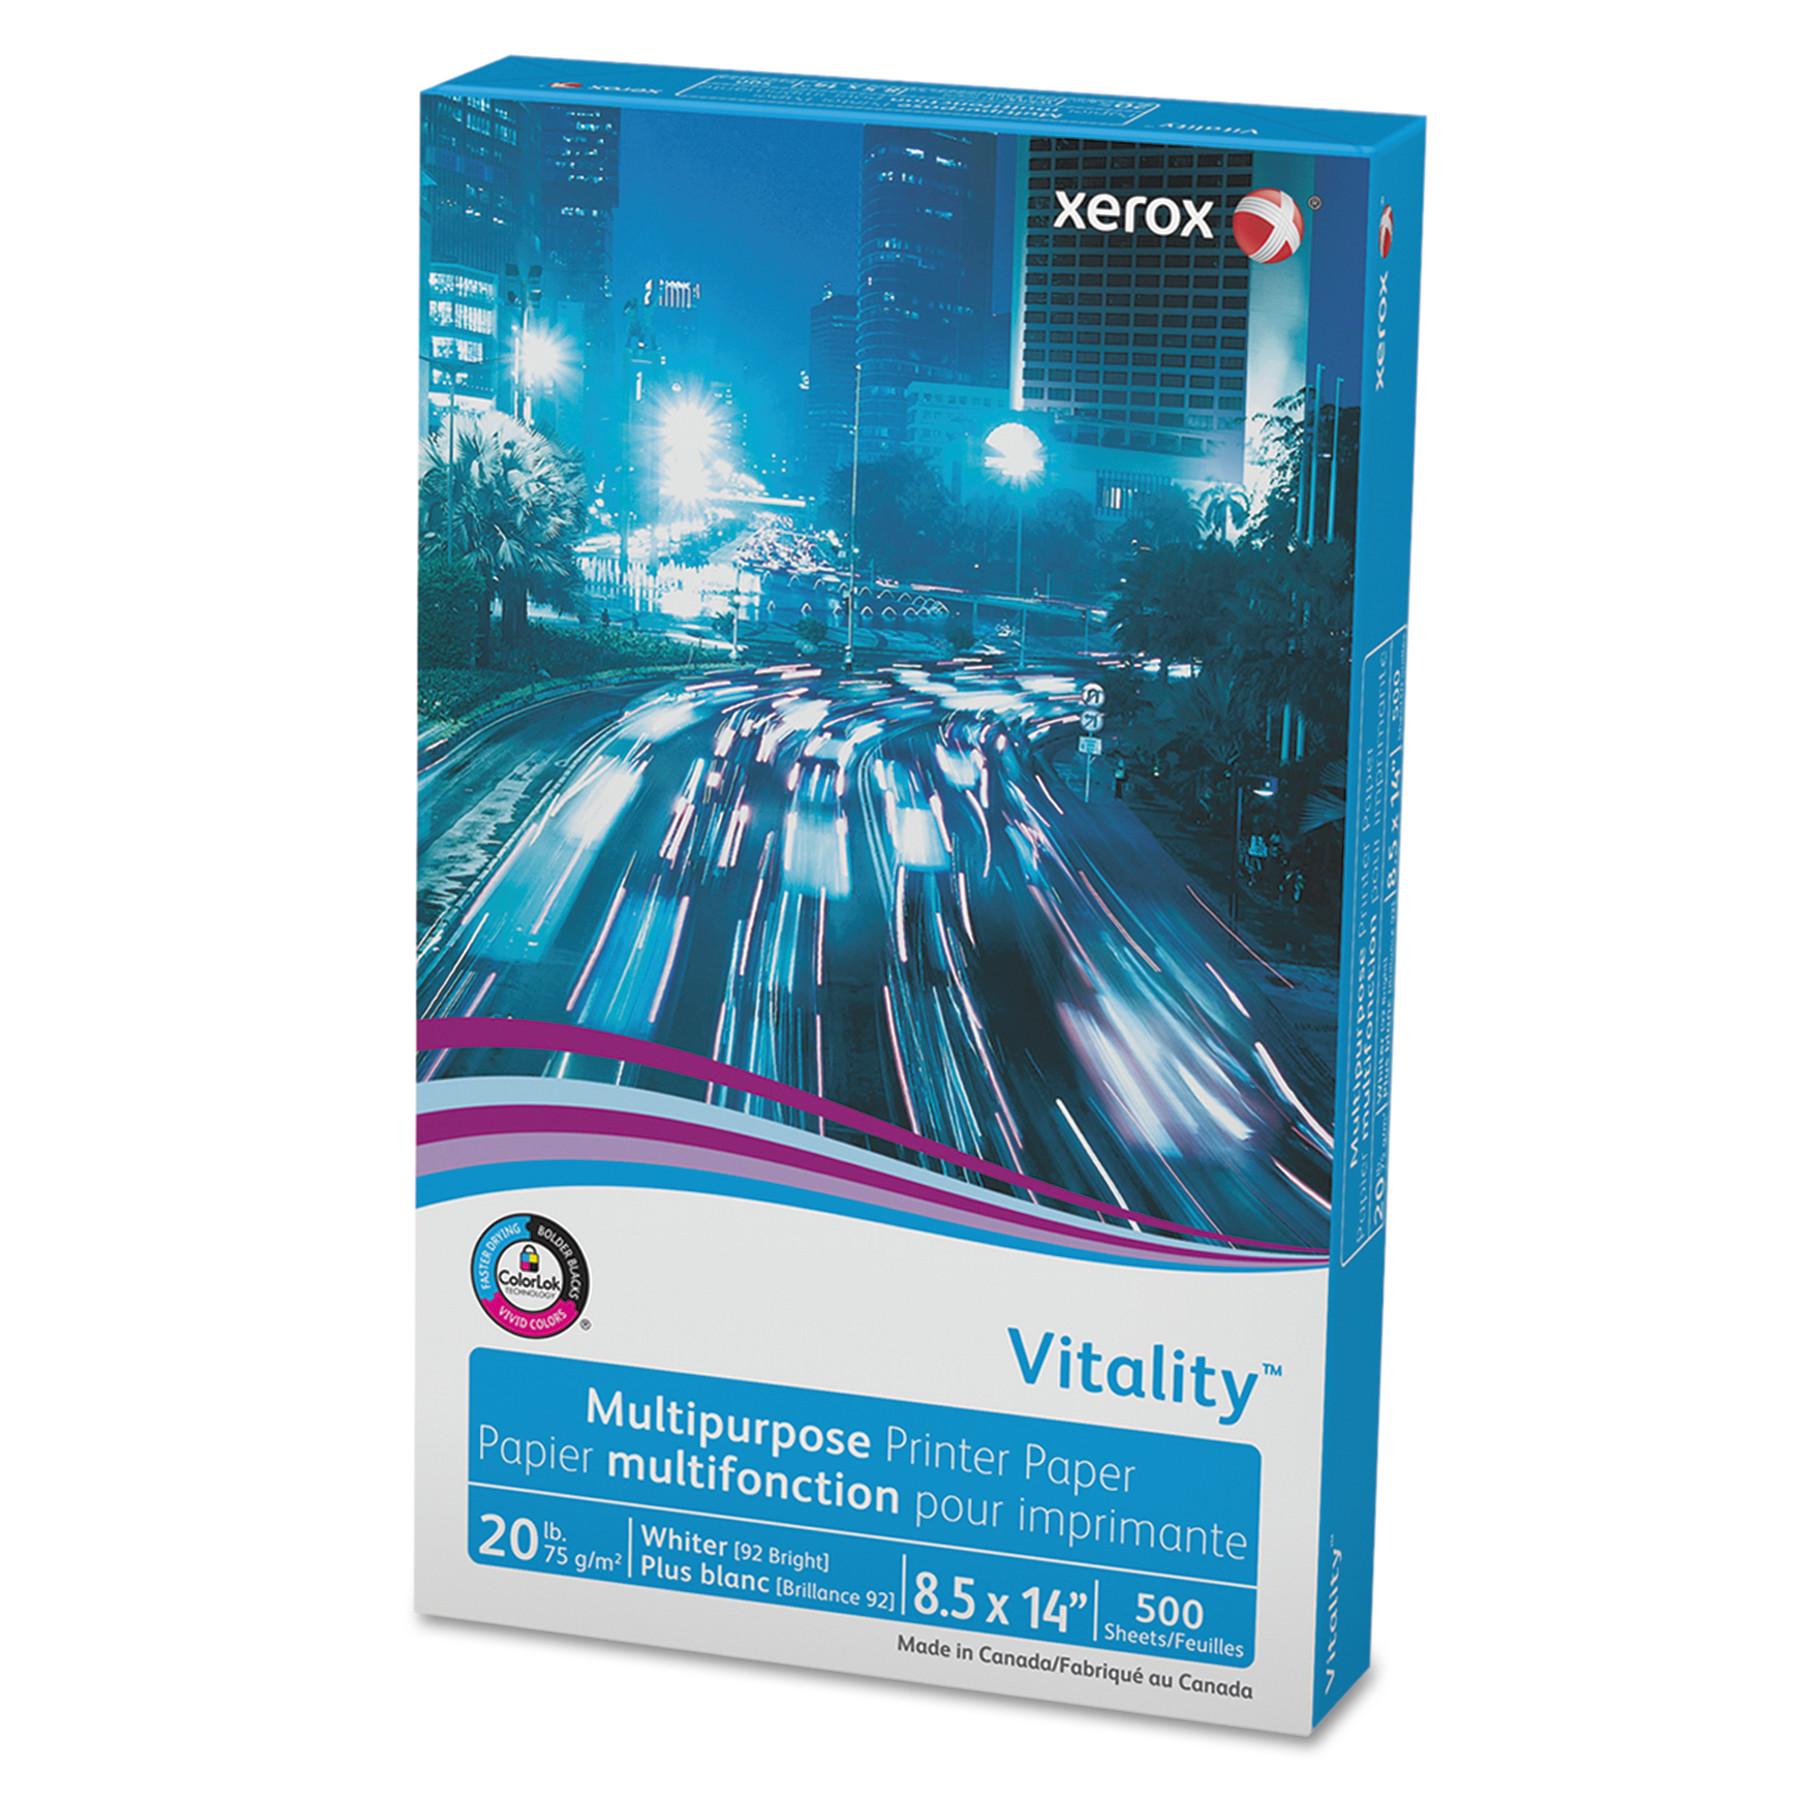 Xerox Vitality Multipurpose Printer Paper, 8 1/2 x 14, White, 500 Sheets/RM